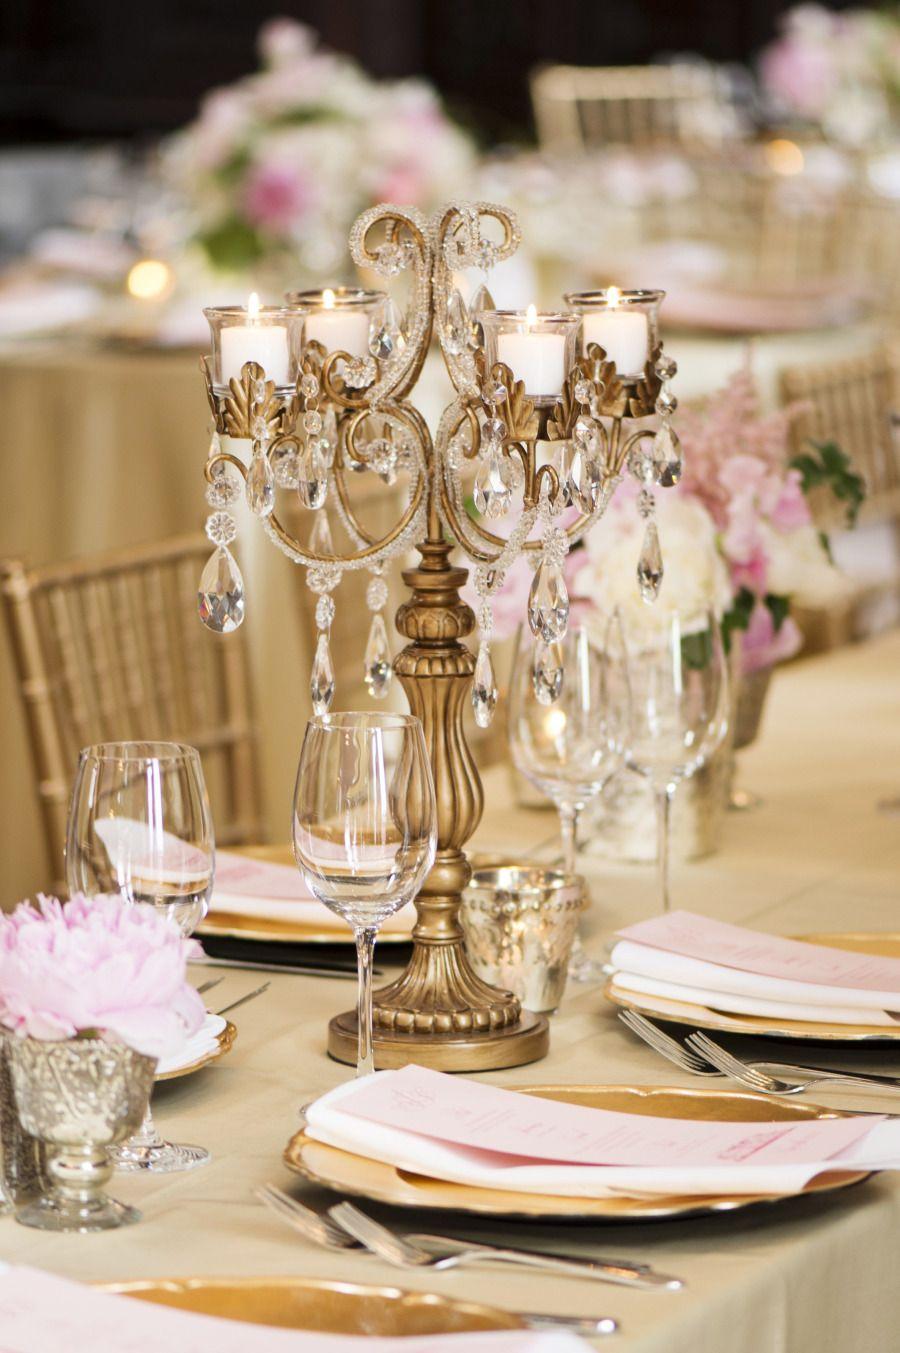 Wedding decoration ideas gold  Classy Elegant and Glamorous Gold Wedding Reception Ideas To see